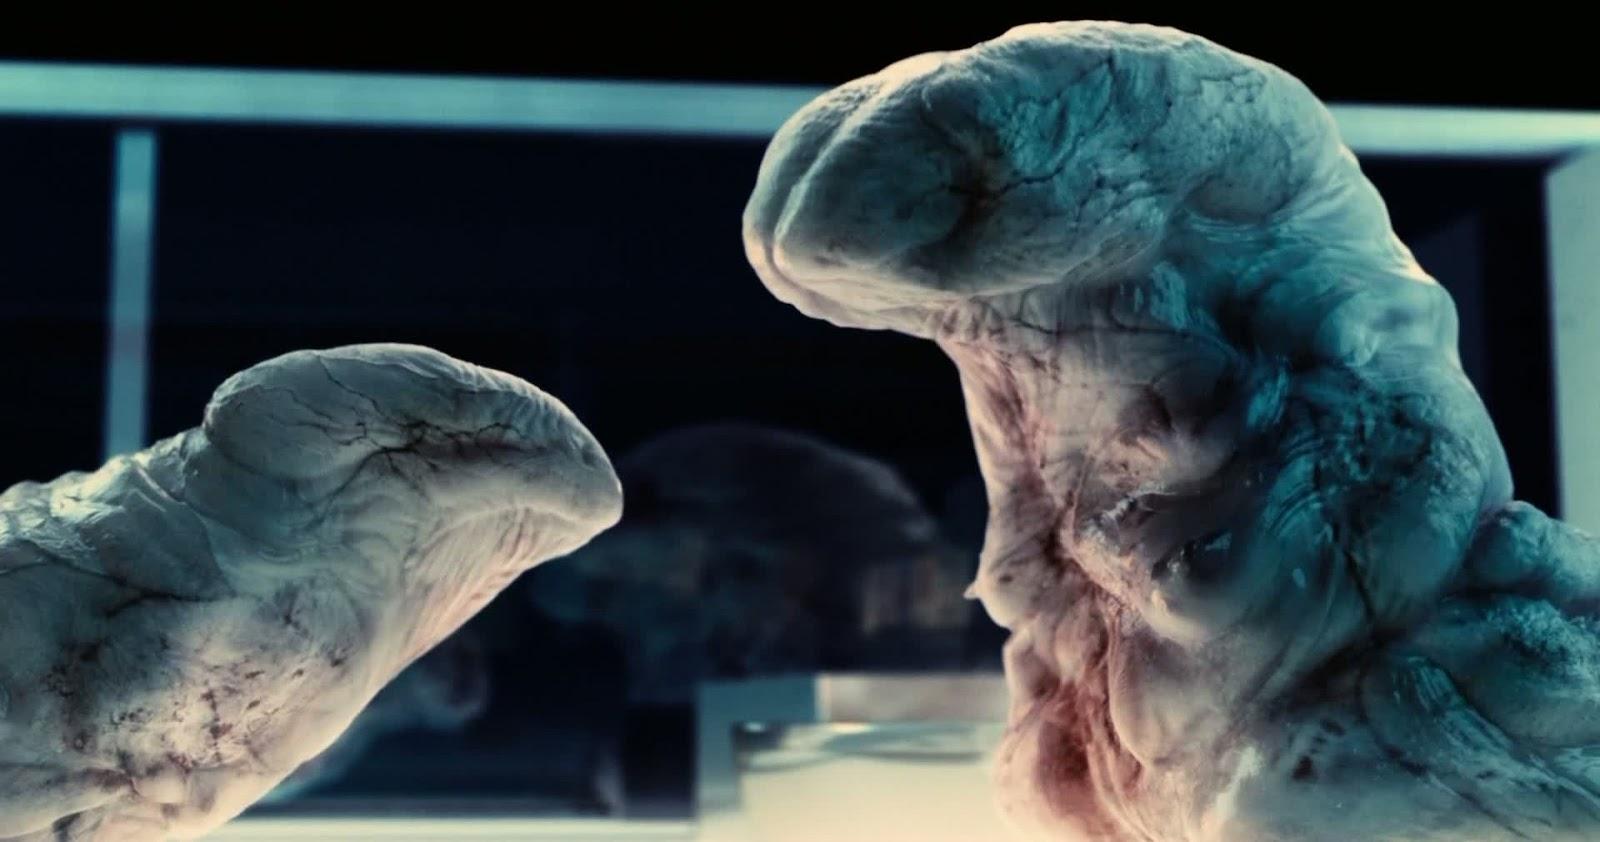 A Cosmobiologist's Dream: The Modular Body